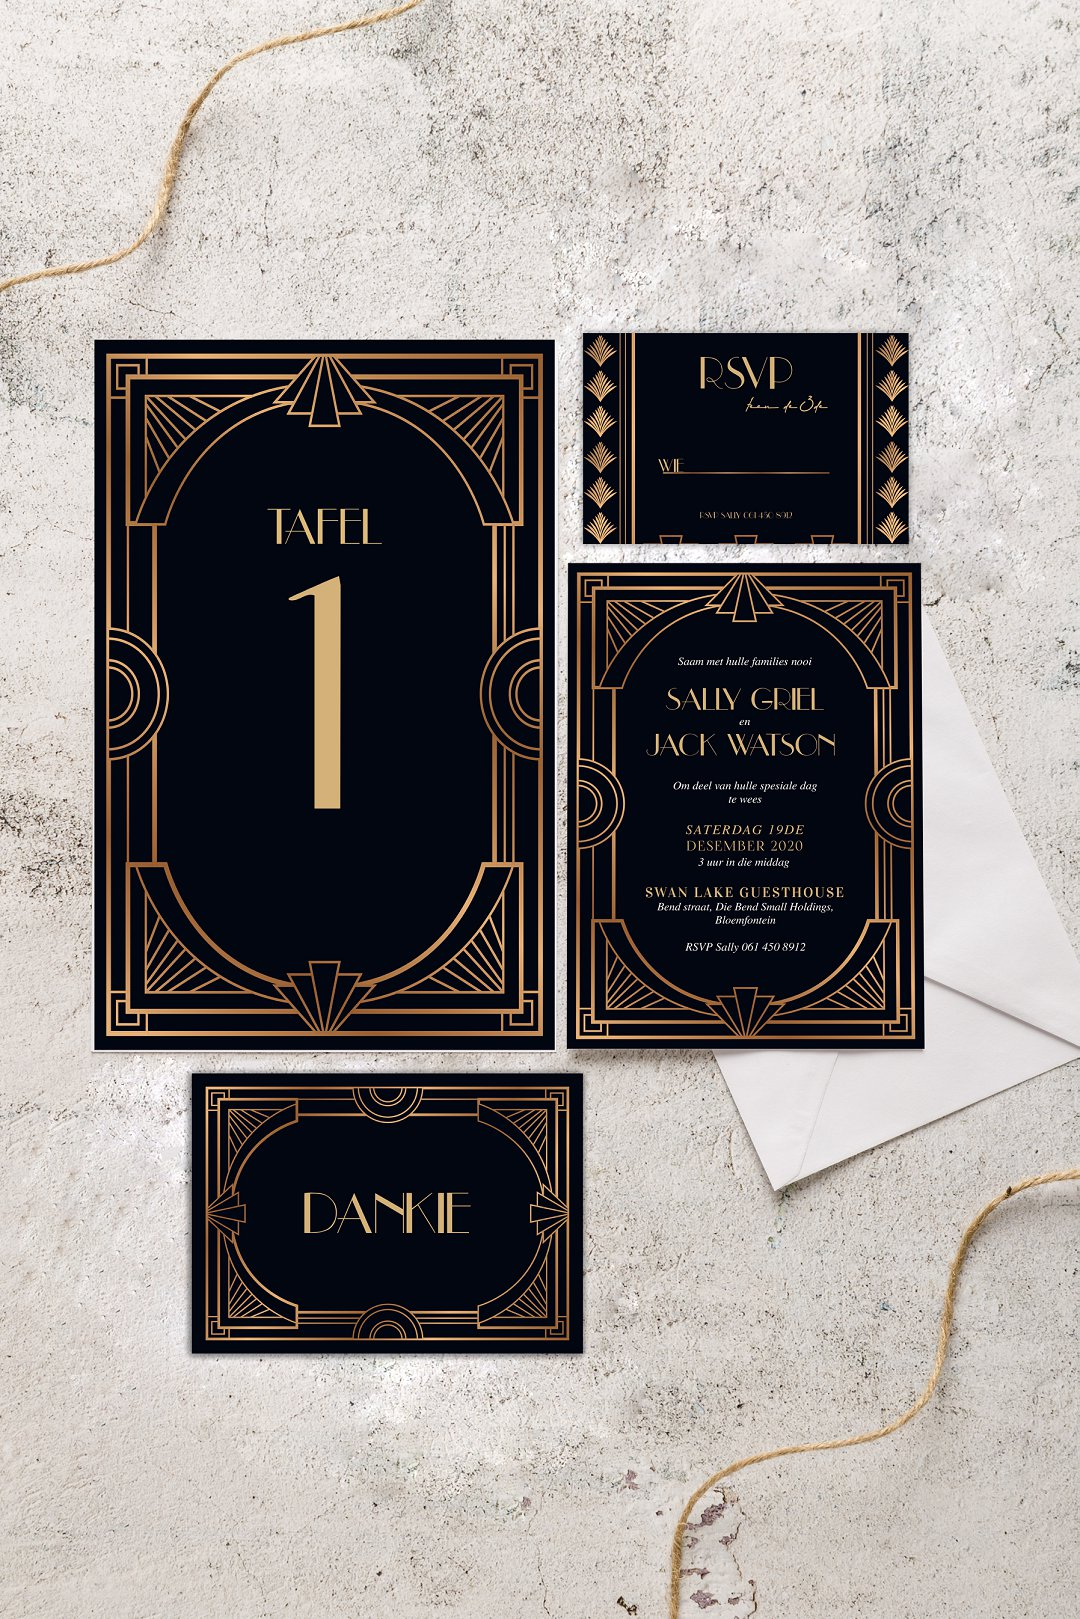 Art Deco inspired wedding stationery